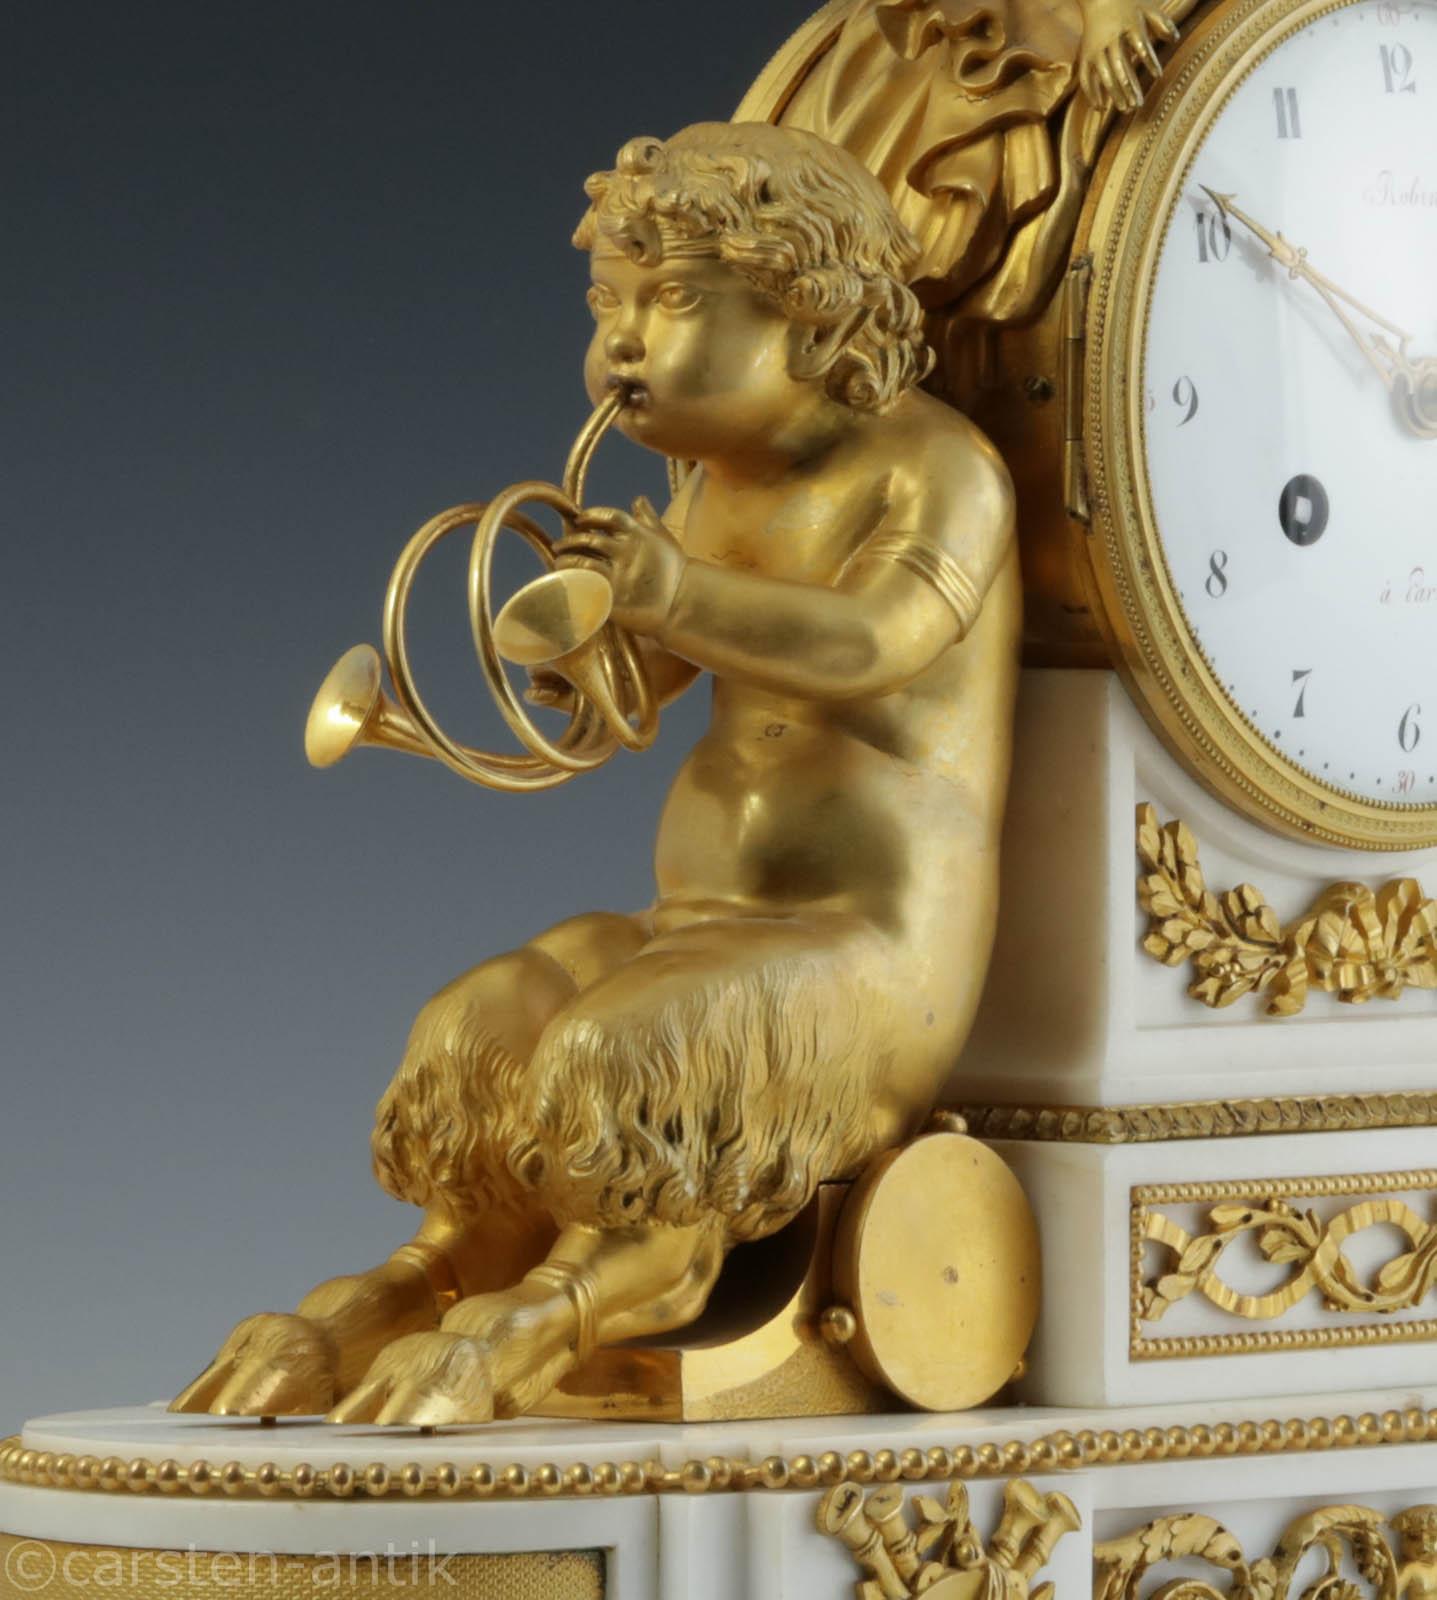 Quartz mechanism Machines watchmaker clock needles P4N5